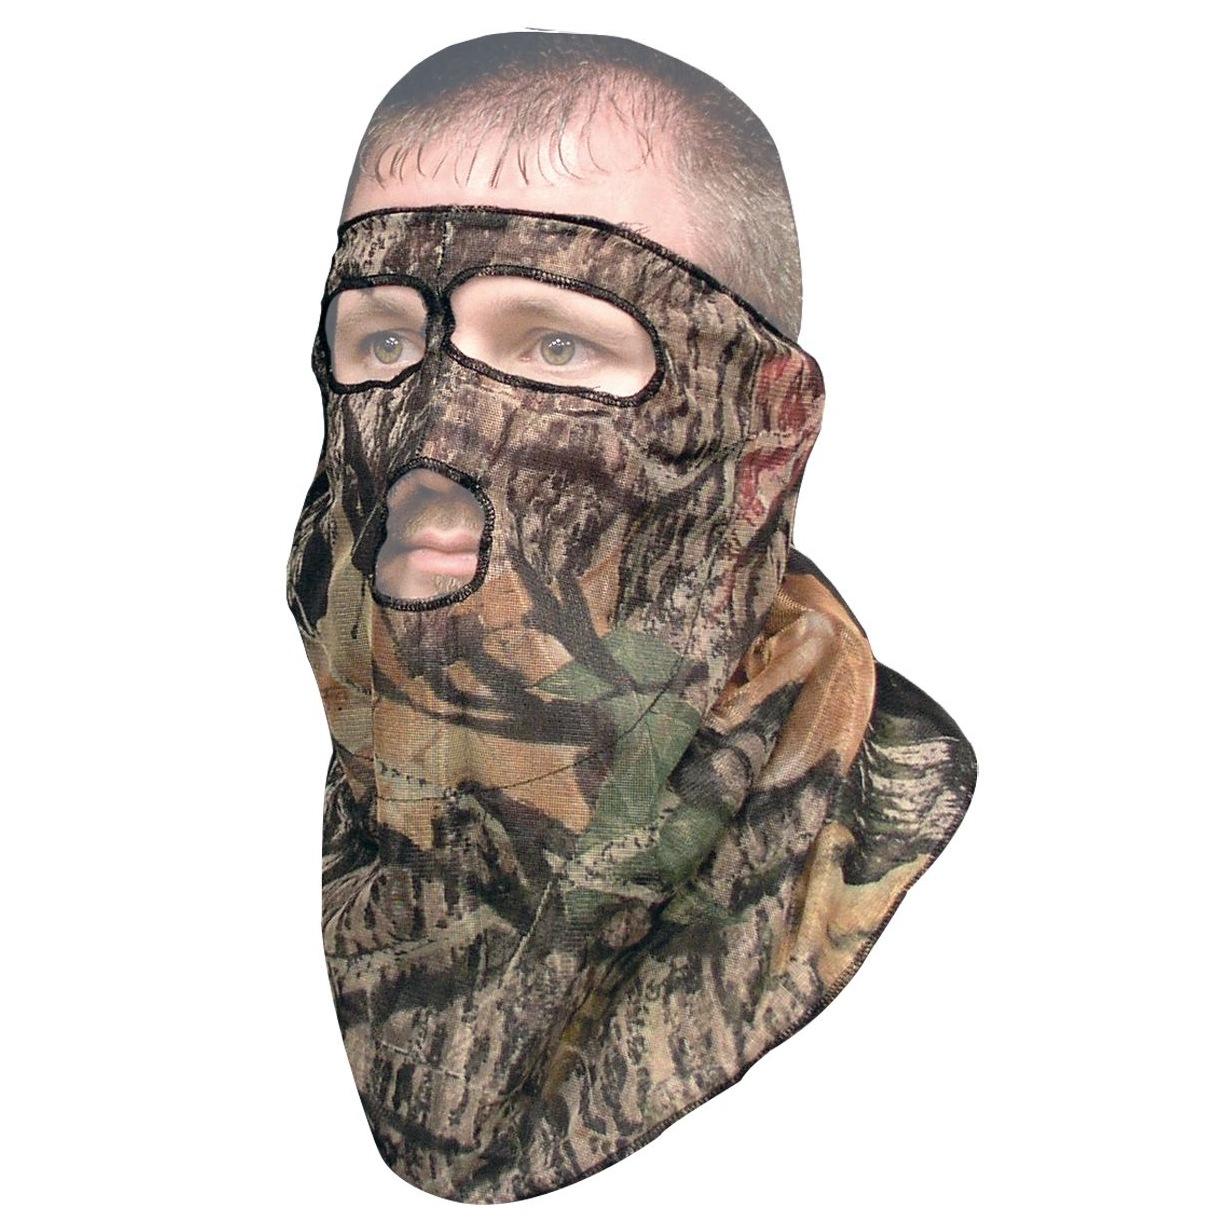 1cbdef7c50906 Primos Ninja Camo face mask mossy oak break up camo 3 4 or full ...